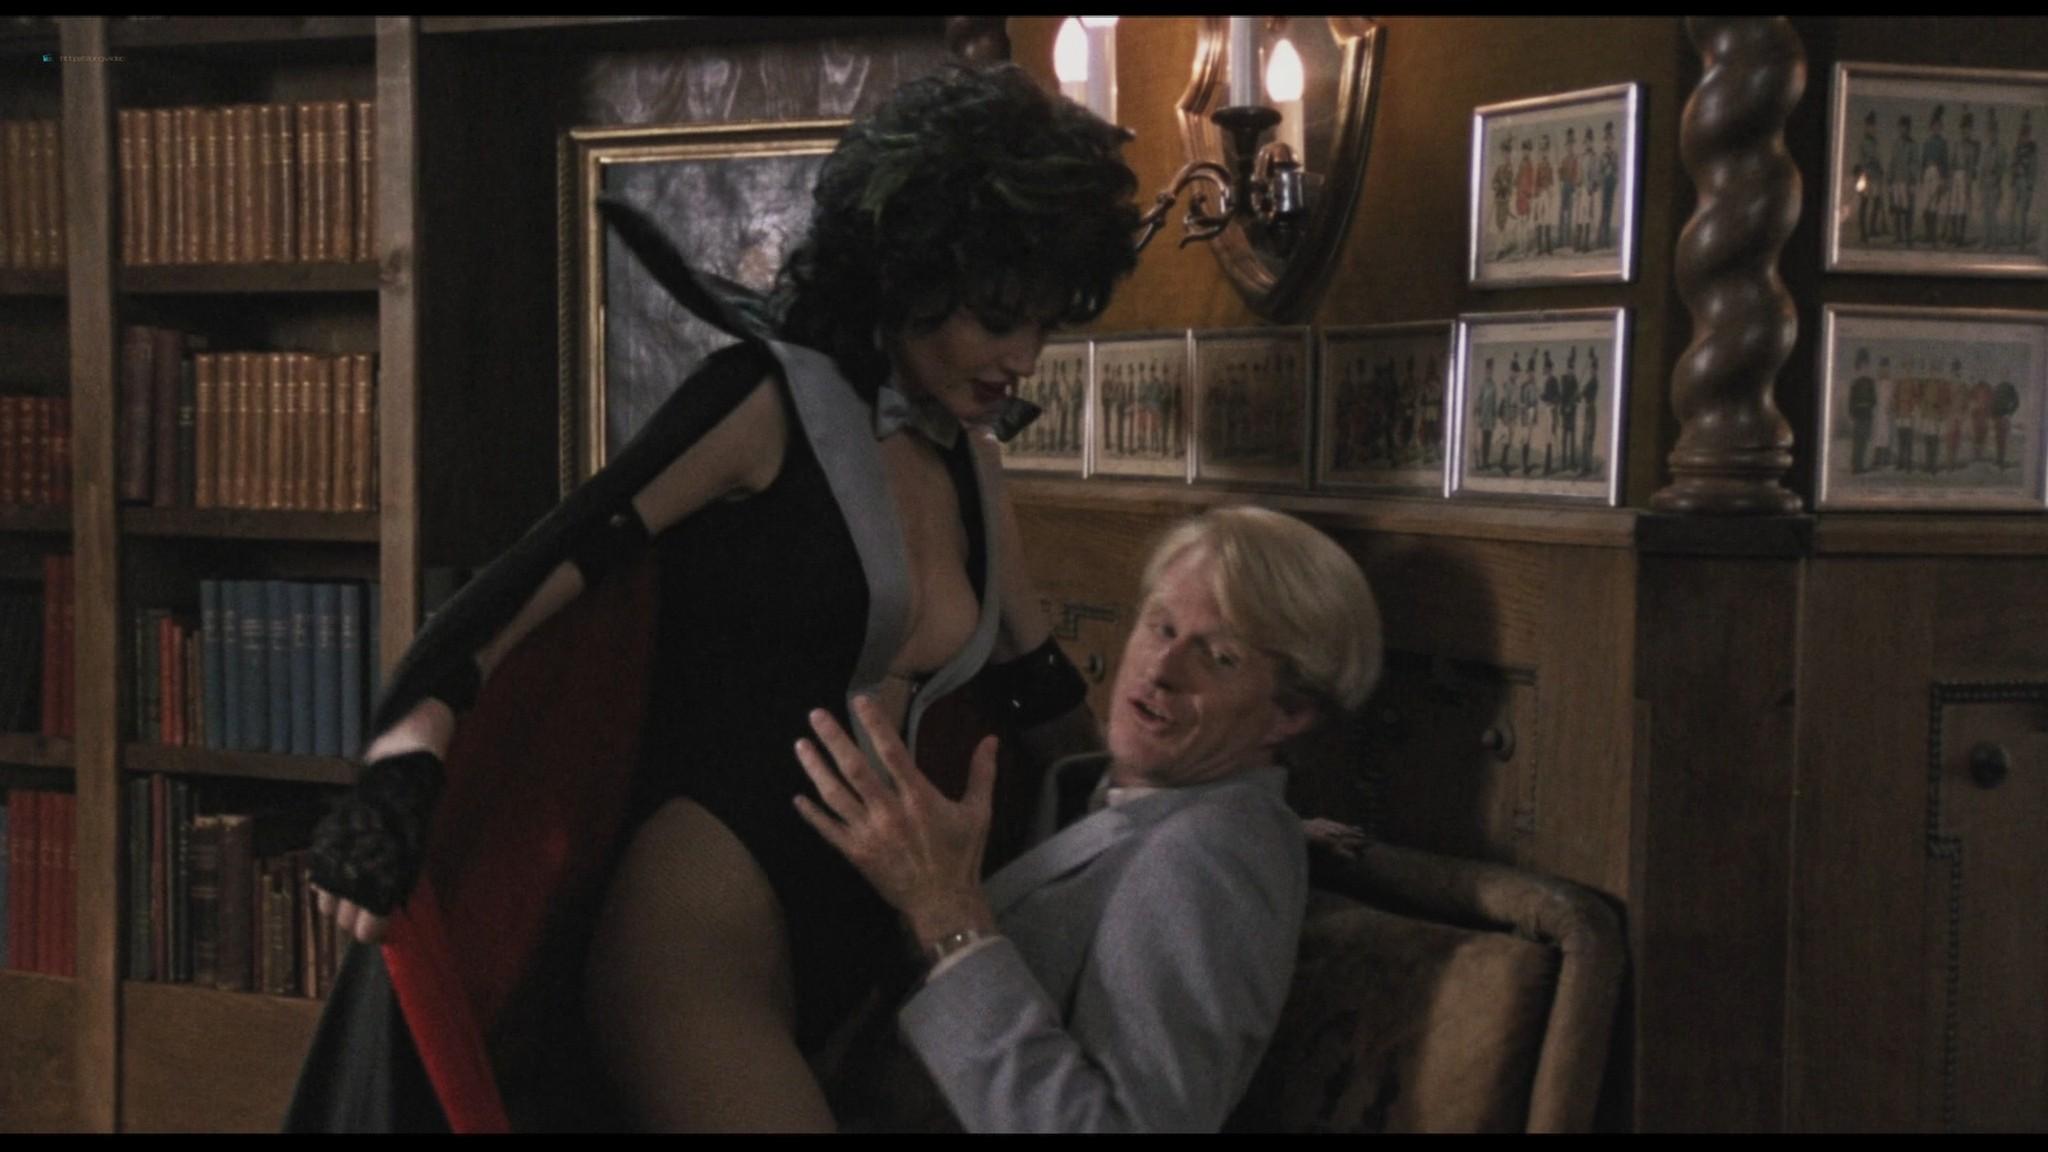 Geena Davis hot and sexy Ksenia Prohaska sexy - Transylvania 6-5000 (1985) HD 1080p BluRay (14)